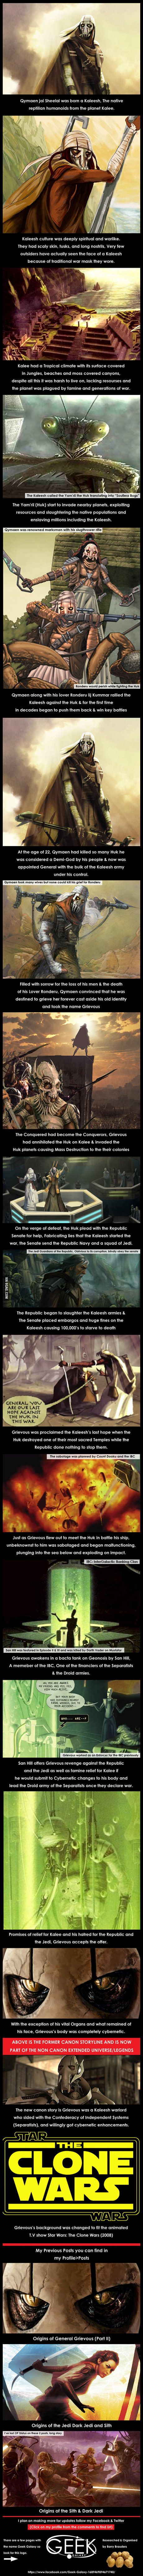 Star Wars | Expanded universe | Origins of General Grievous (Part 1)